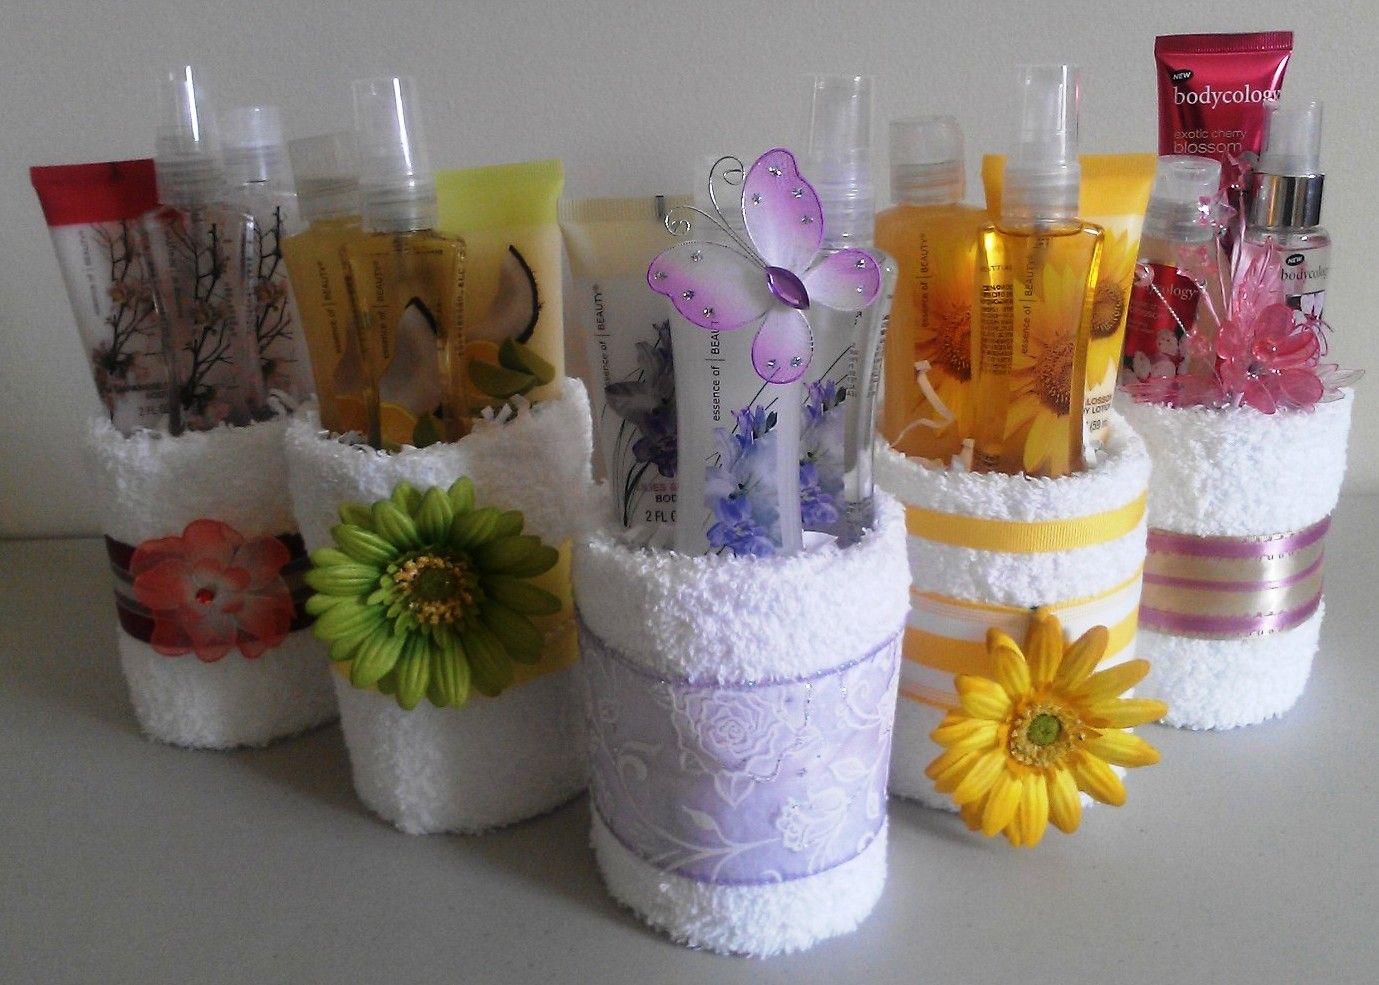 55 Sweet Mother's Day Gift Ideas 2017 Zelfgemaakte